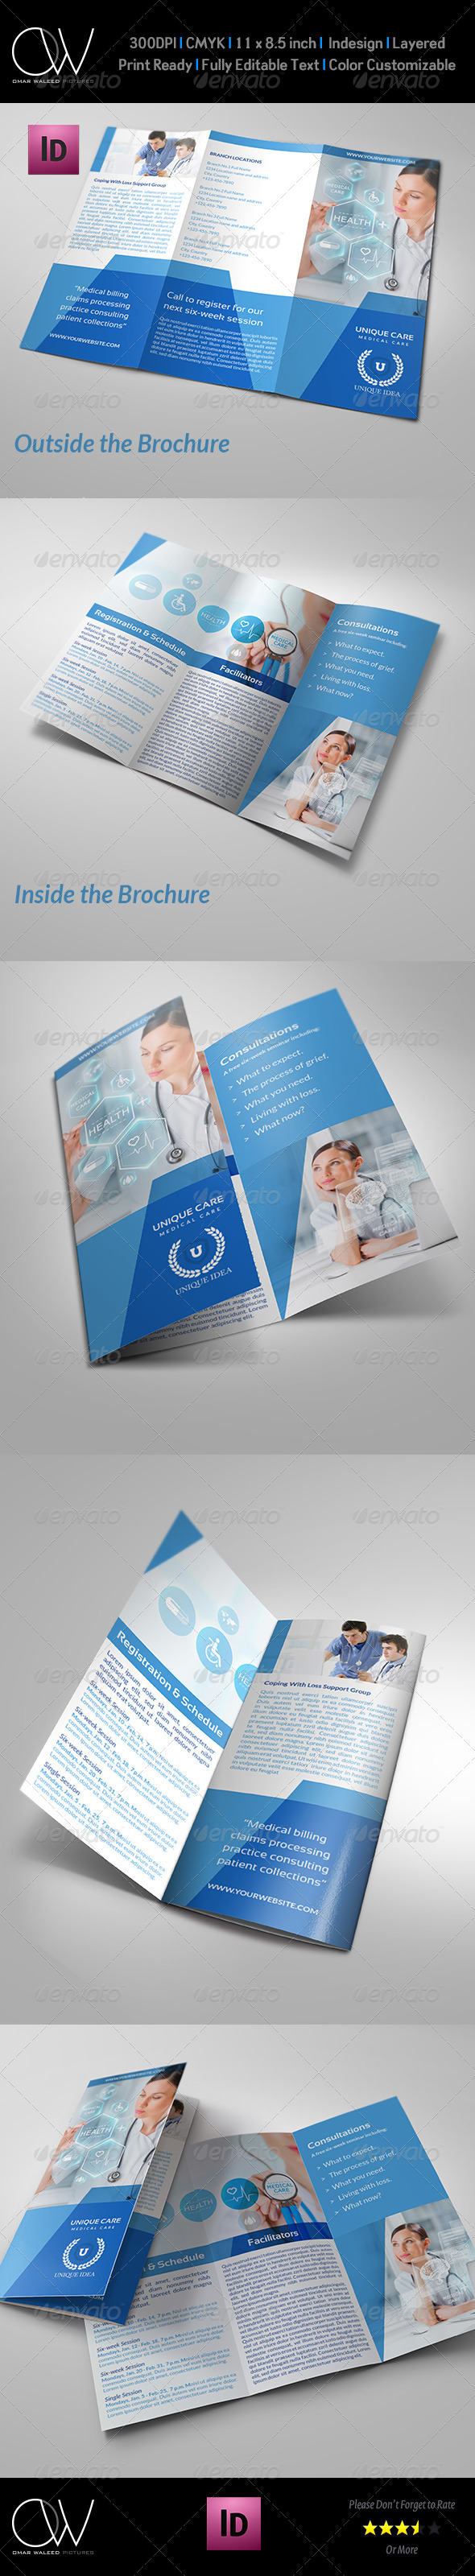 GraphicRiver Hospital Tri-Fold Brochure Template Vol.2 7522023